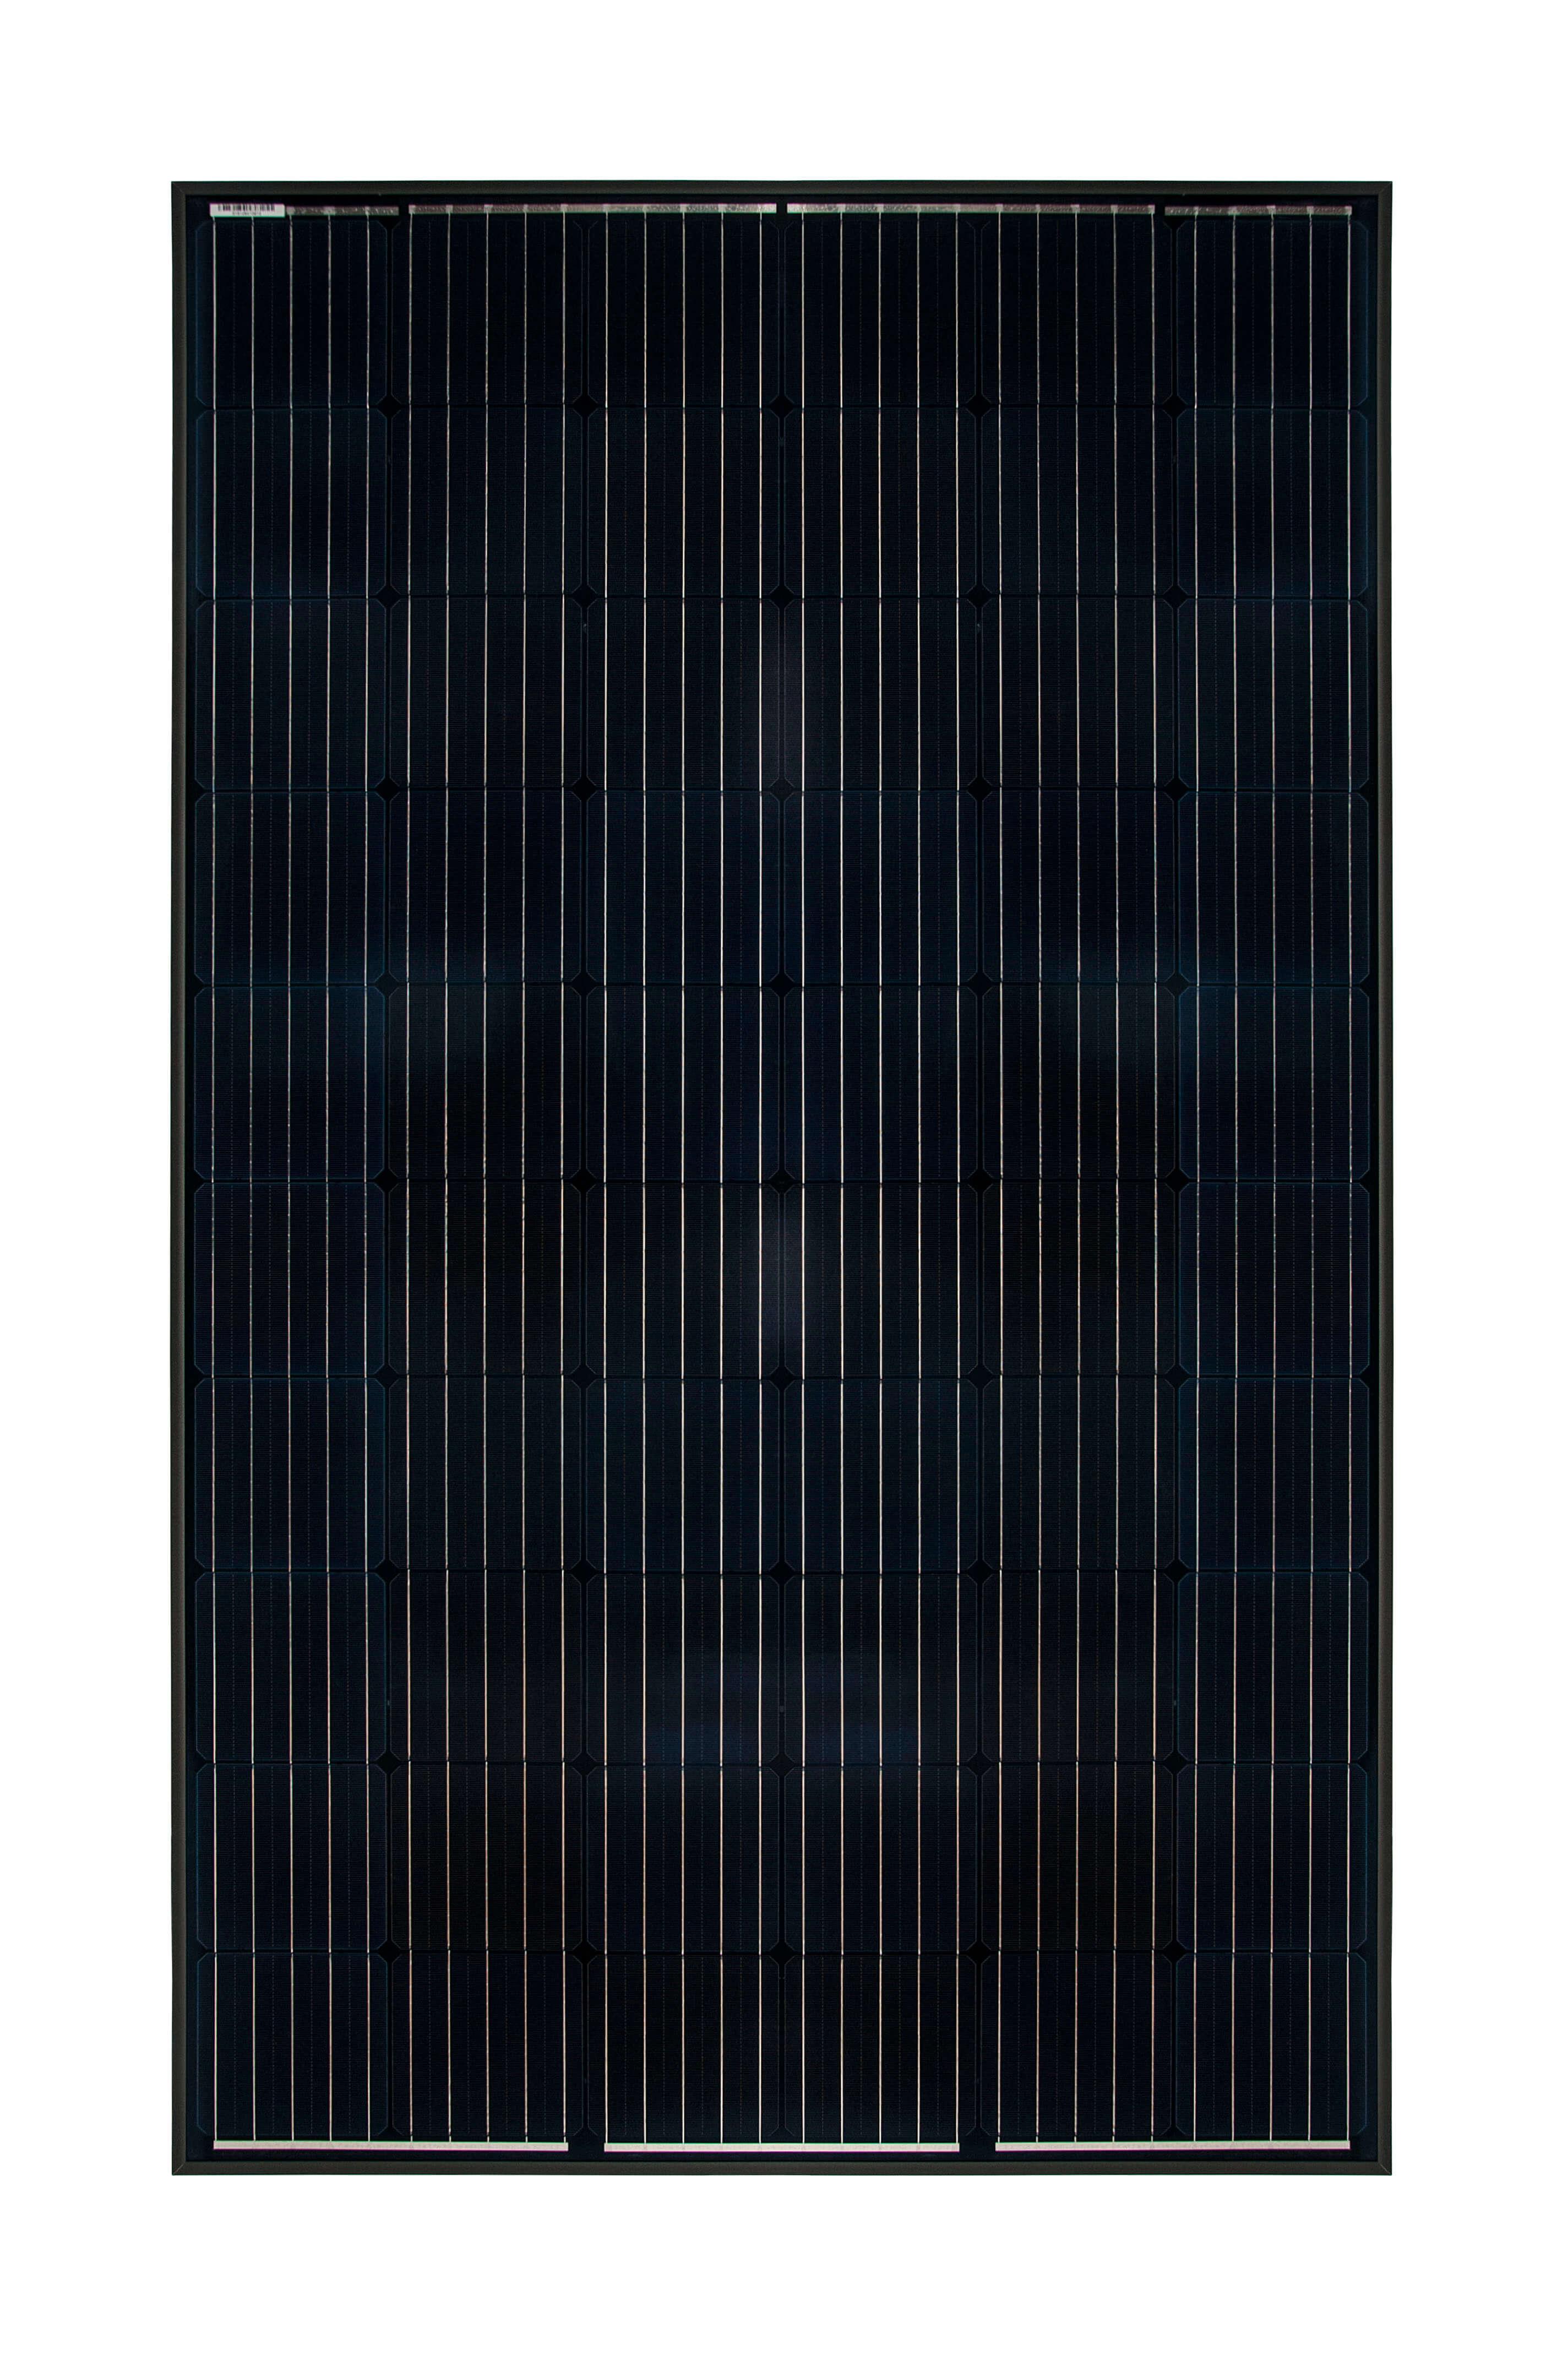 Lg Solar Panels 320 Watt Price